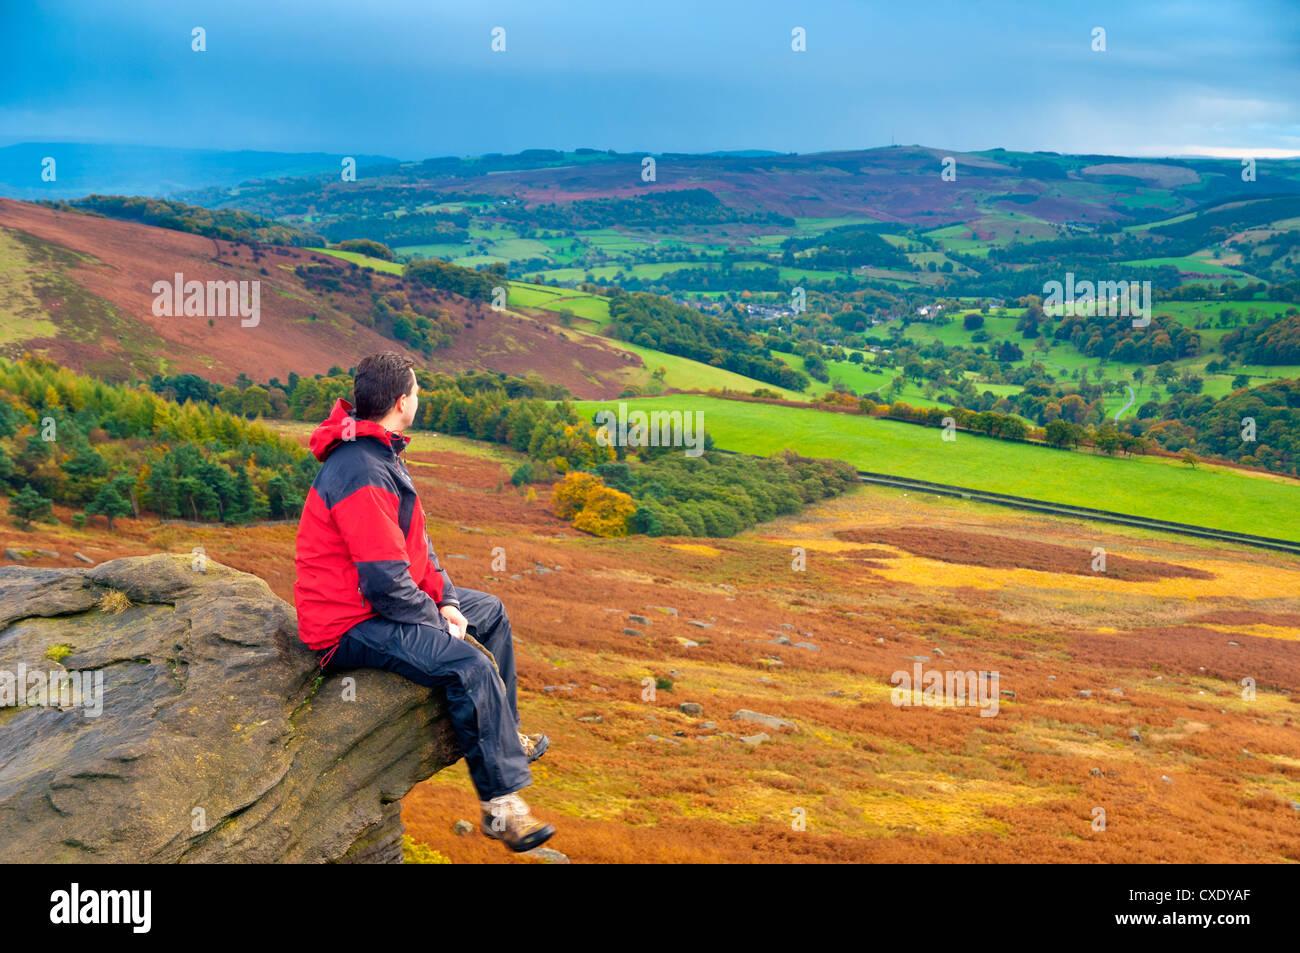 Stanage Edge, Peak District National Park, Derbyshire, England - Stock Image